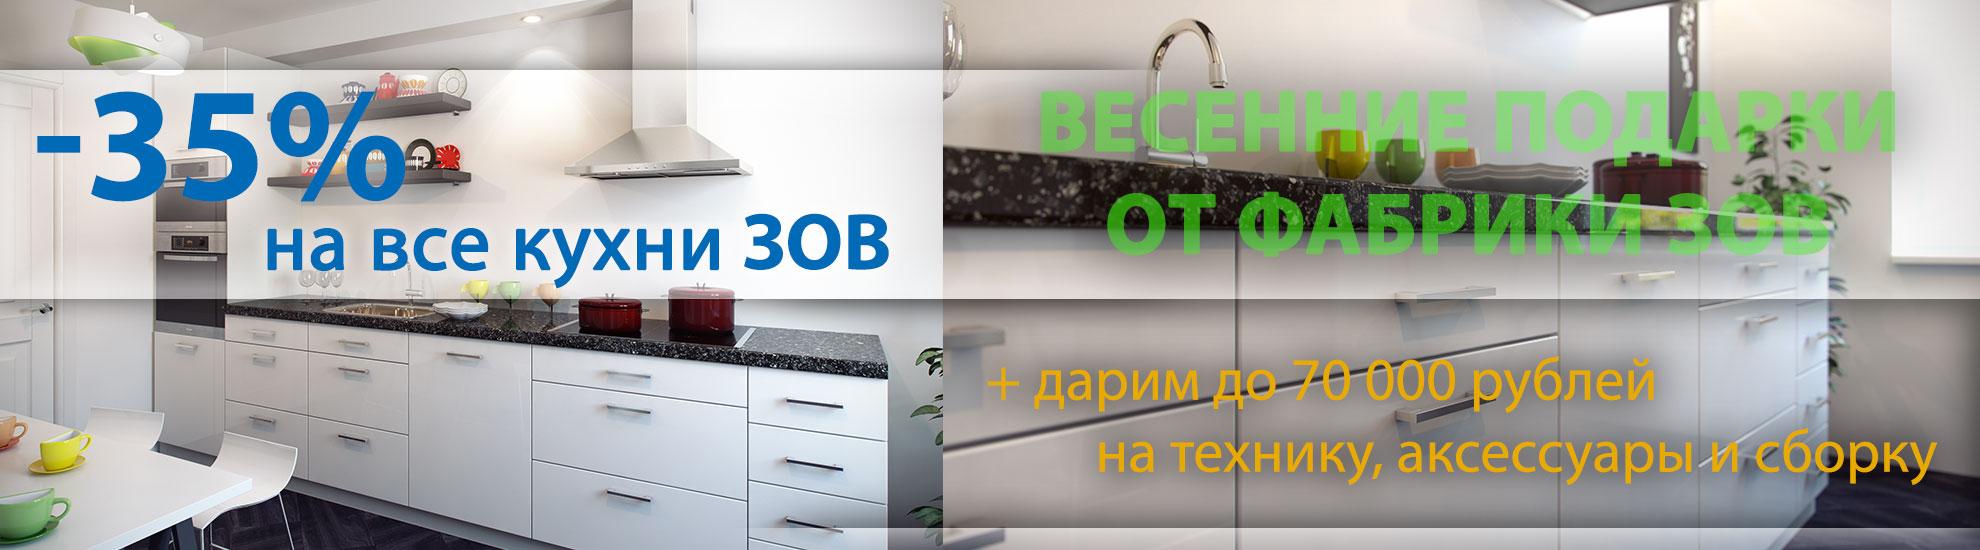 35_vasna_1980_550_sq